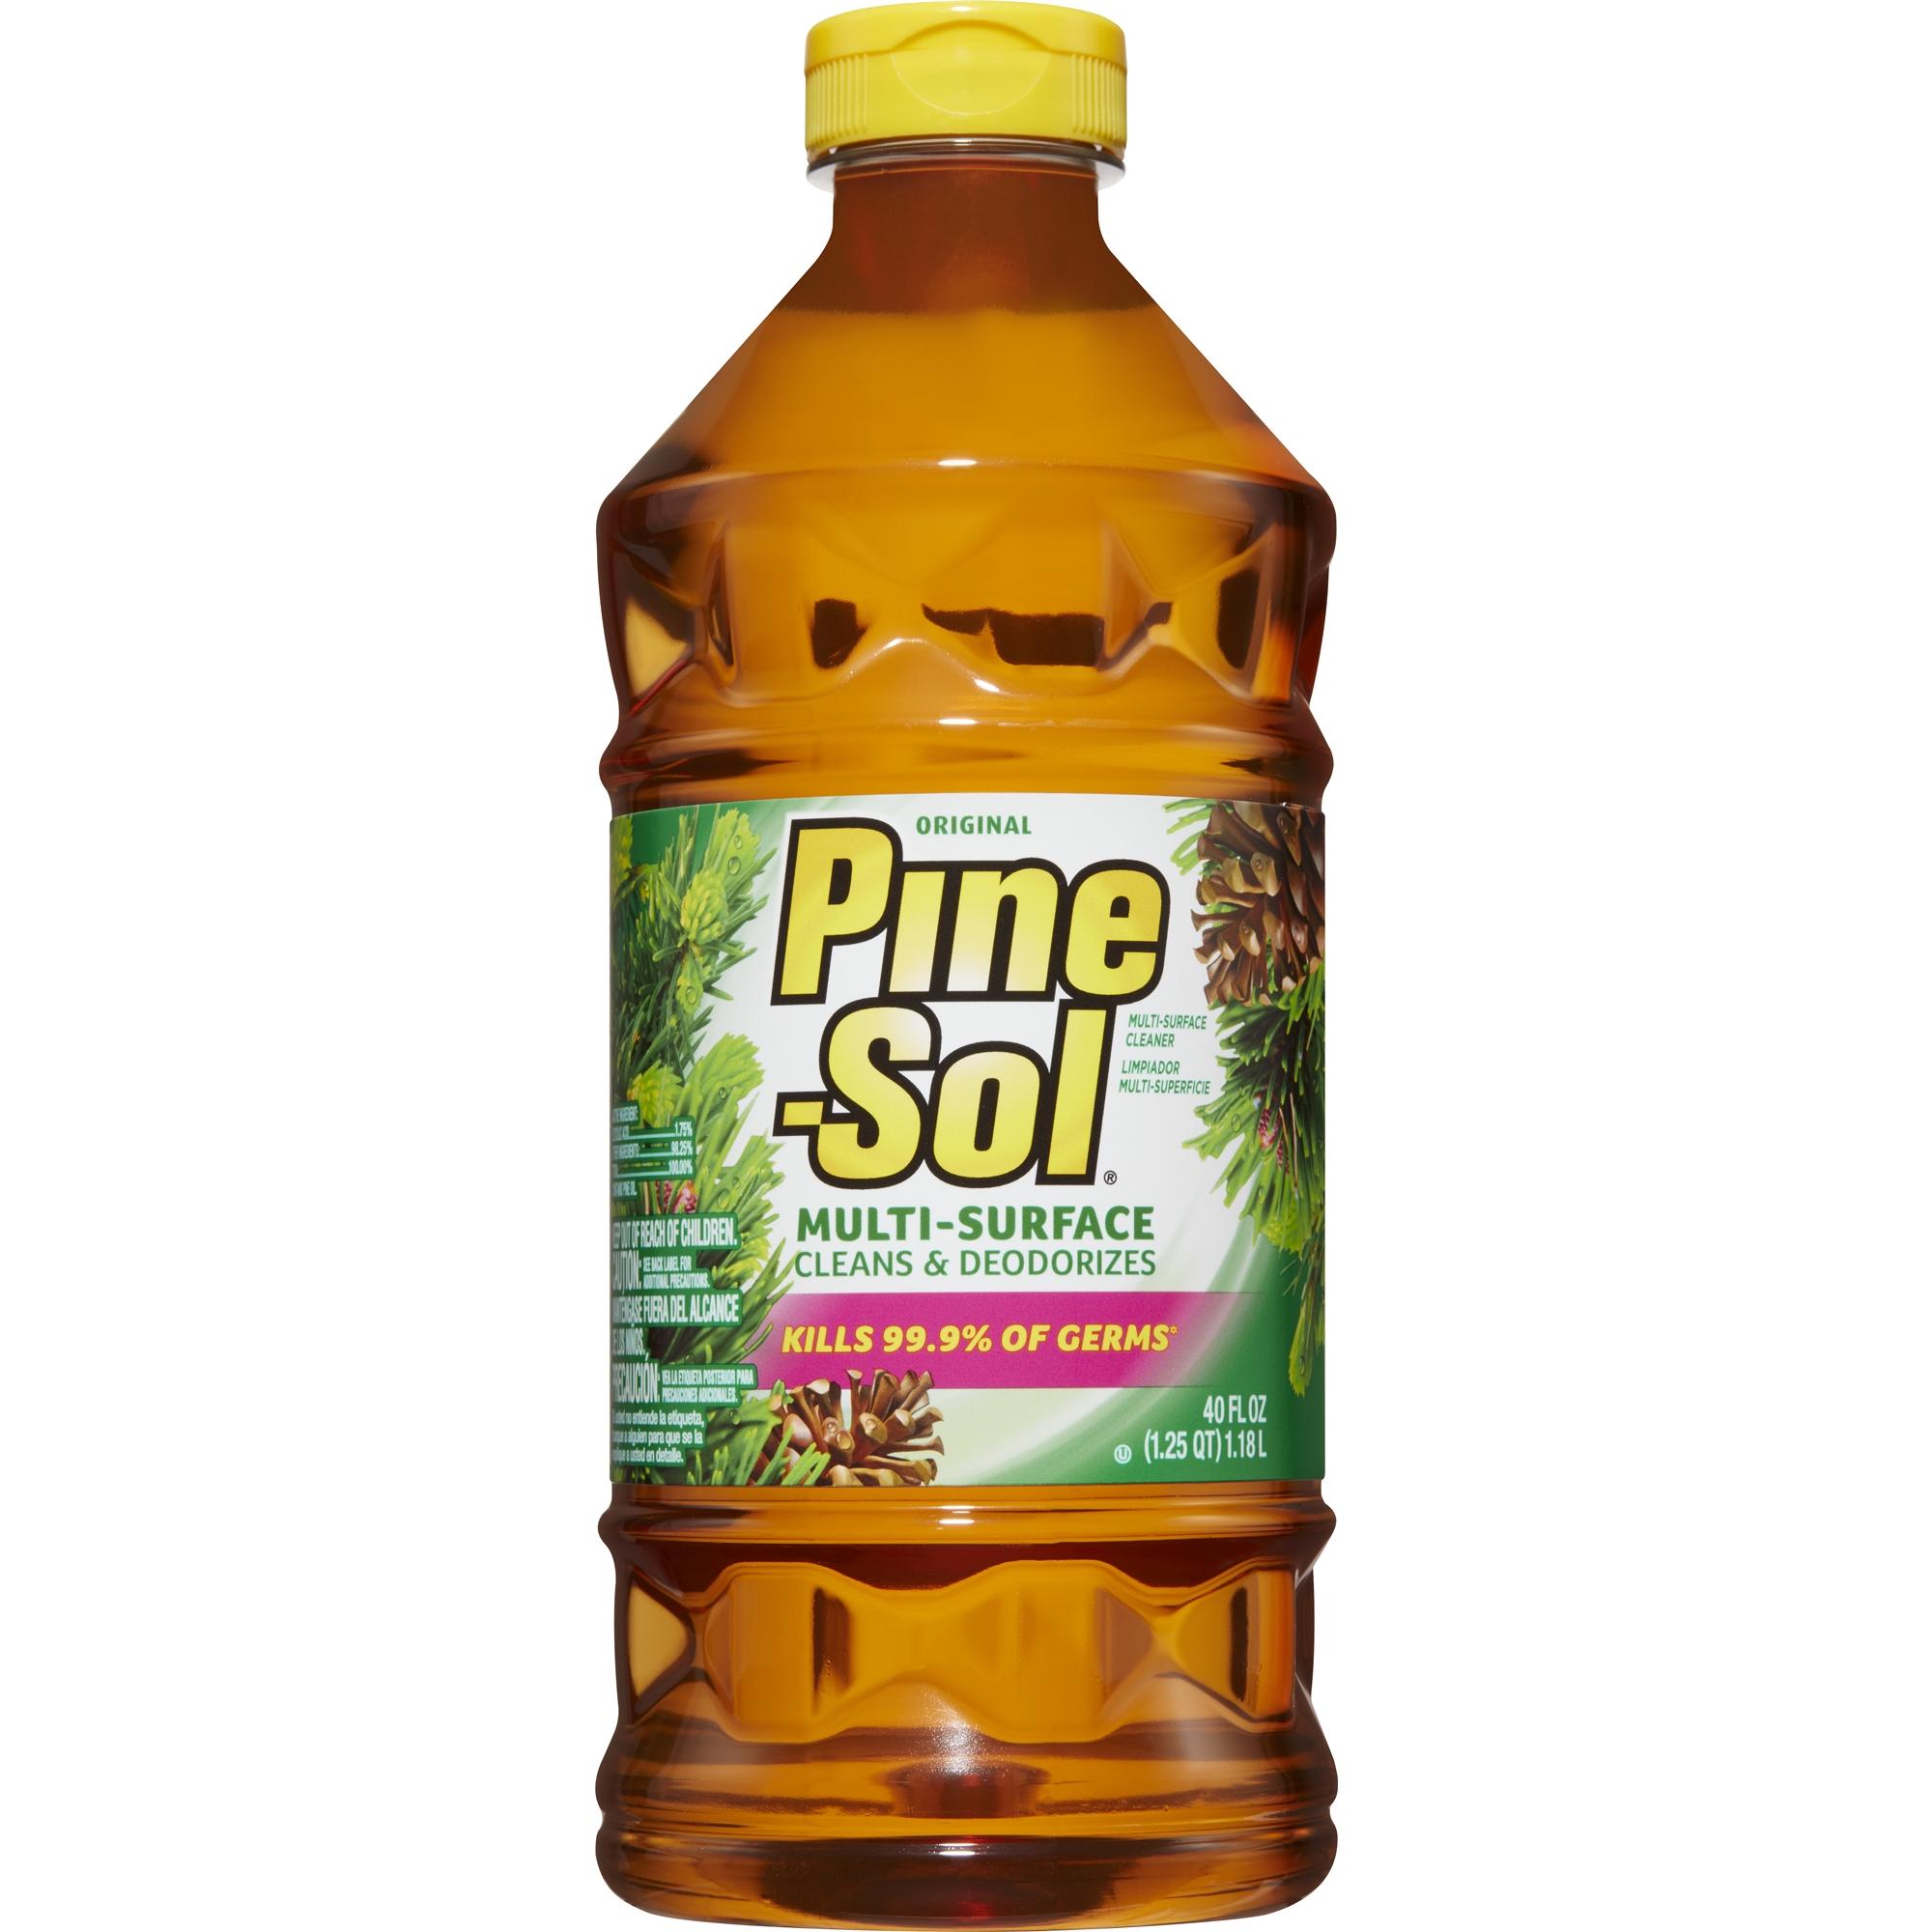 Pine-Sol Multi-Surface All-Purpose Cleaner, Original Scent, 40 oz